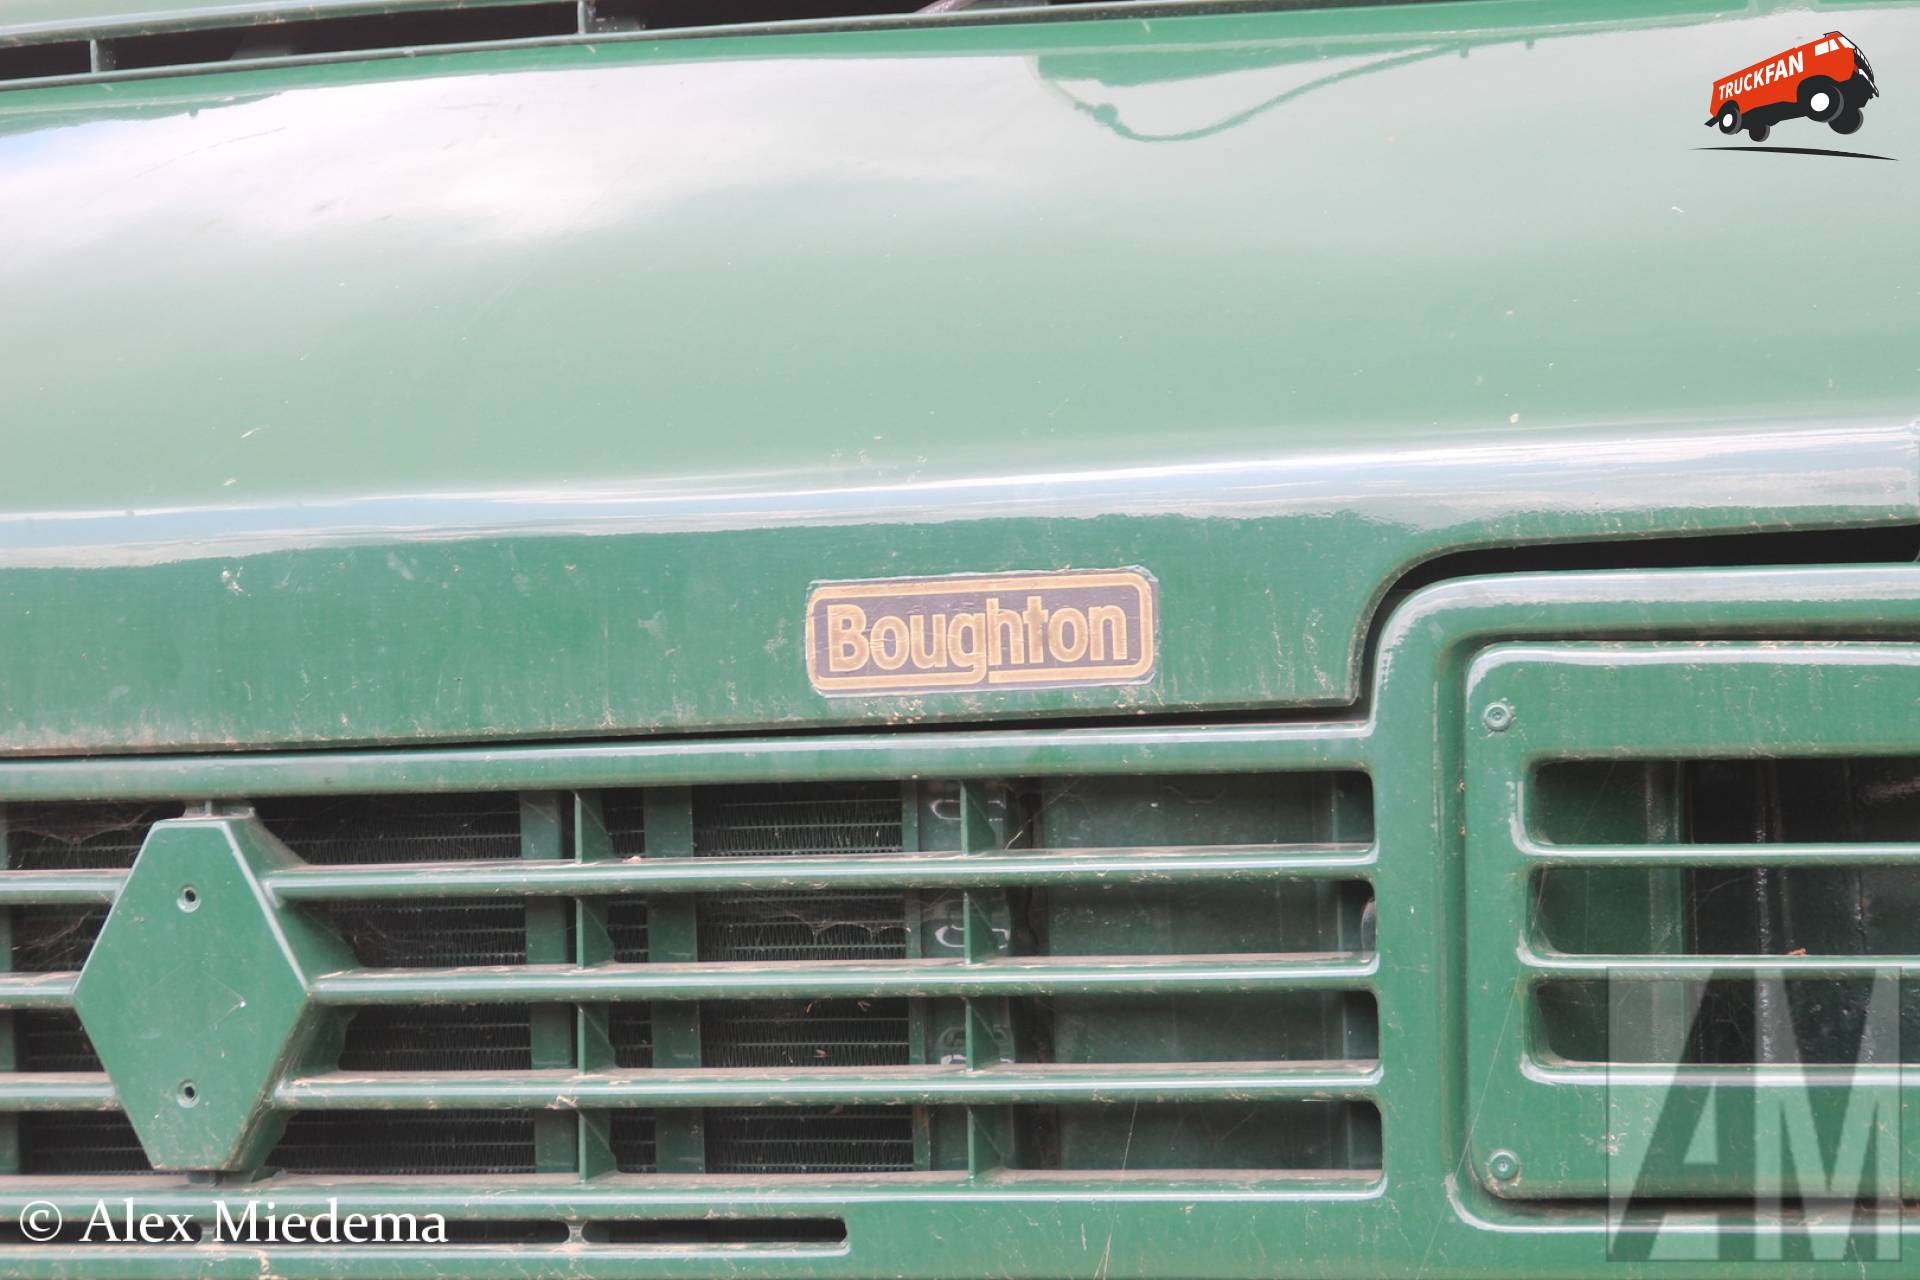 Reynolds Boughton RB44